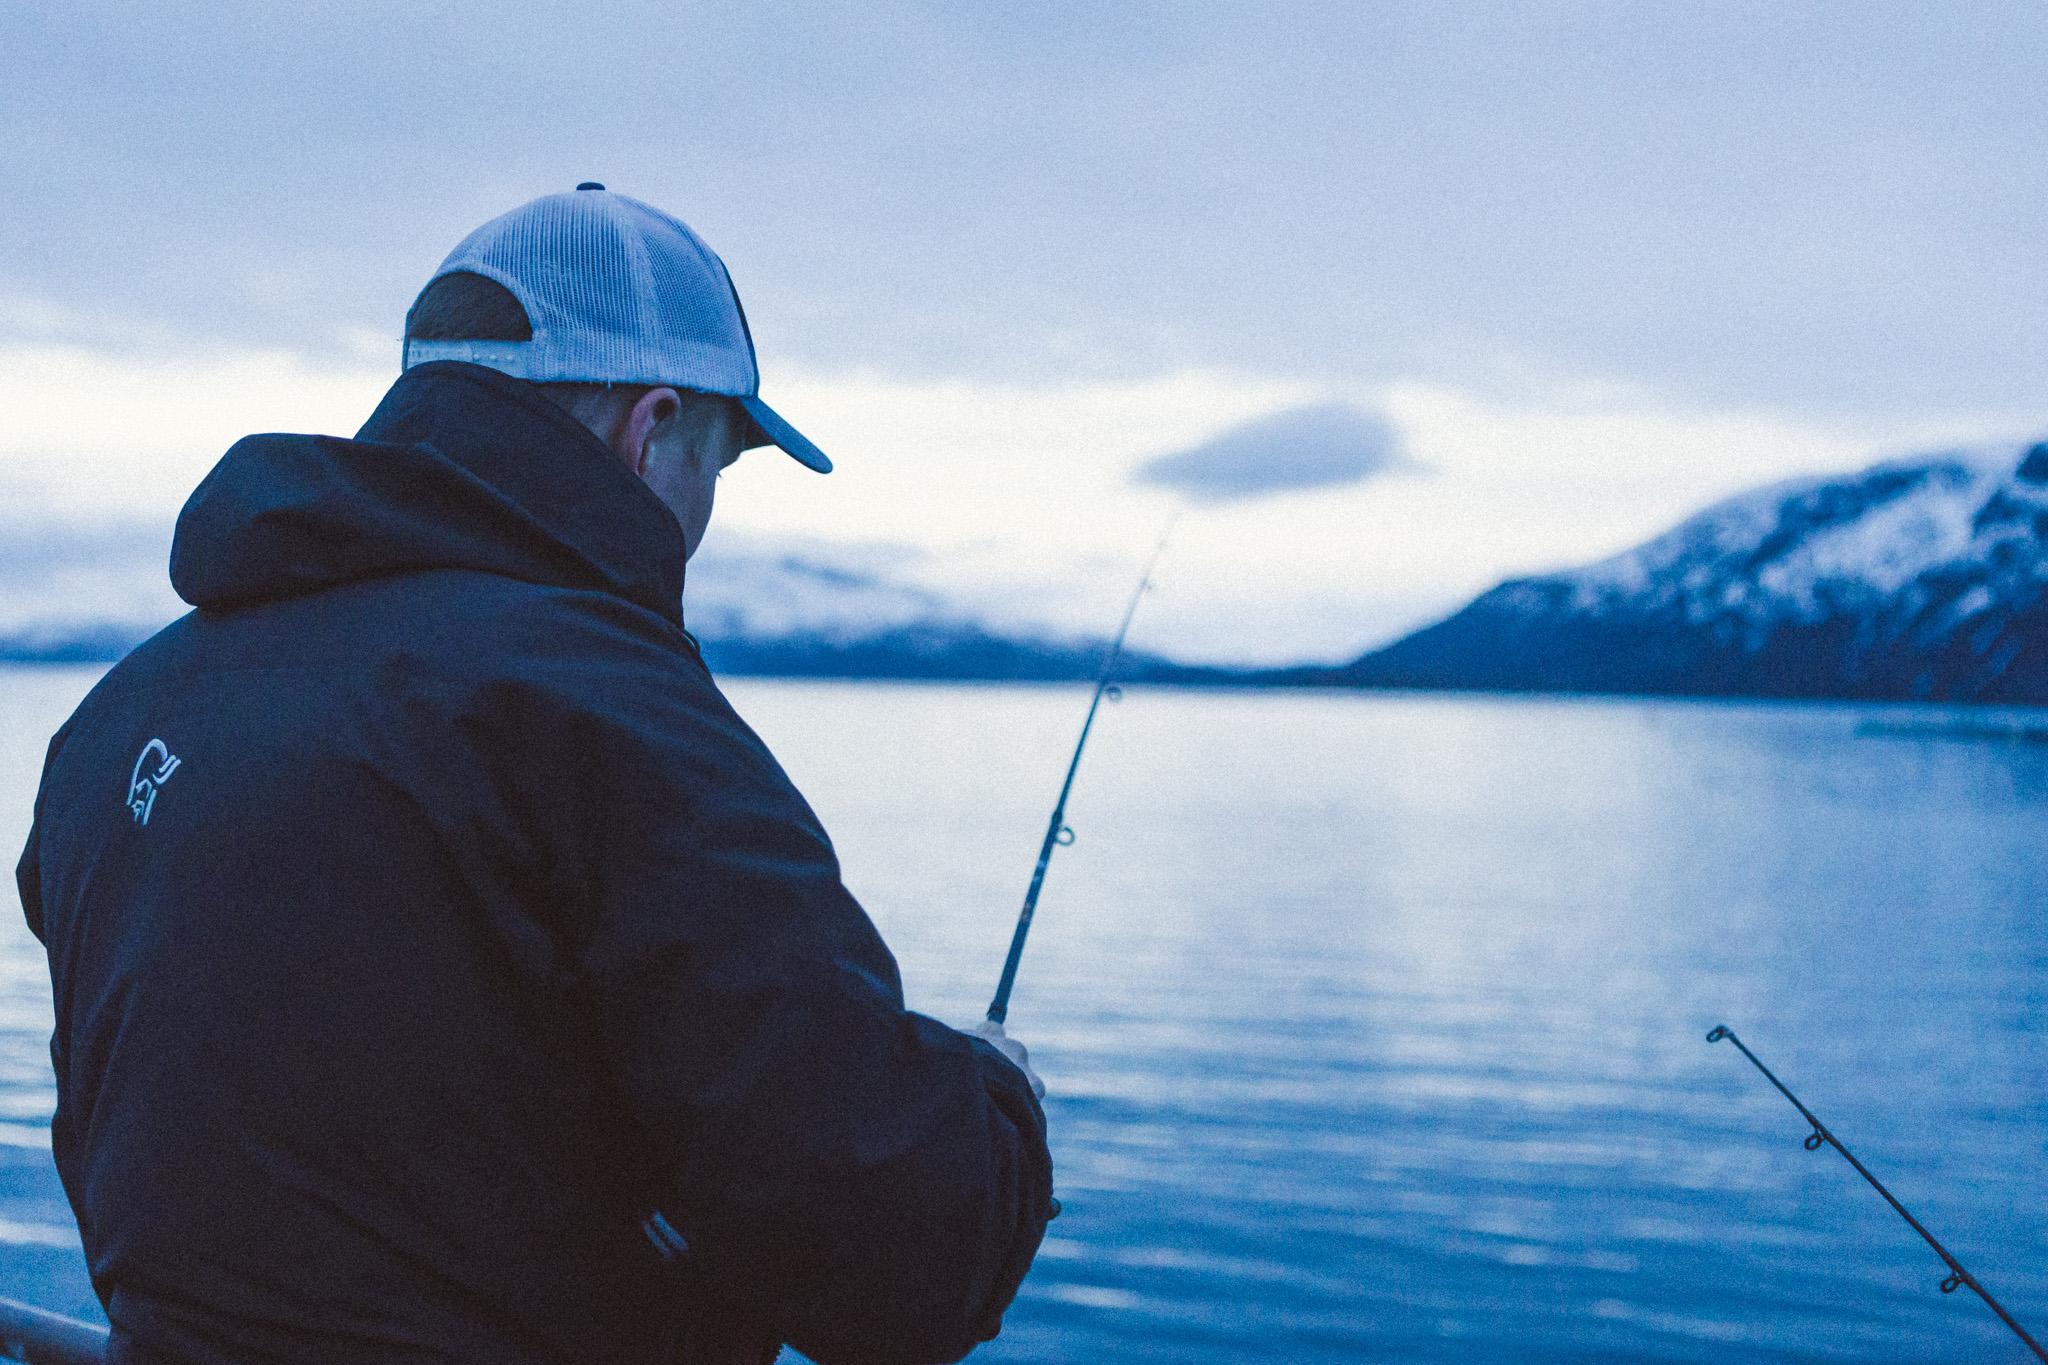 FISHING AT MIDNIGHT